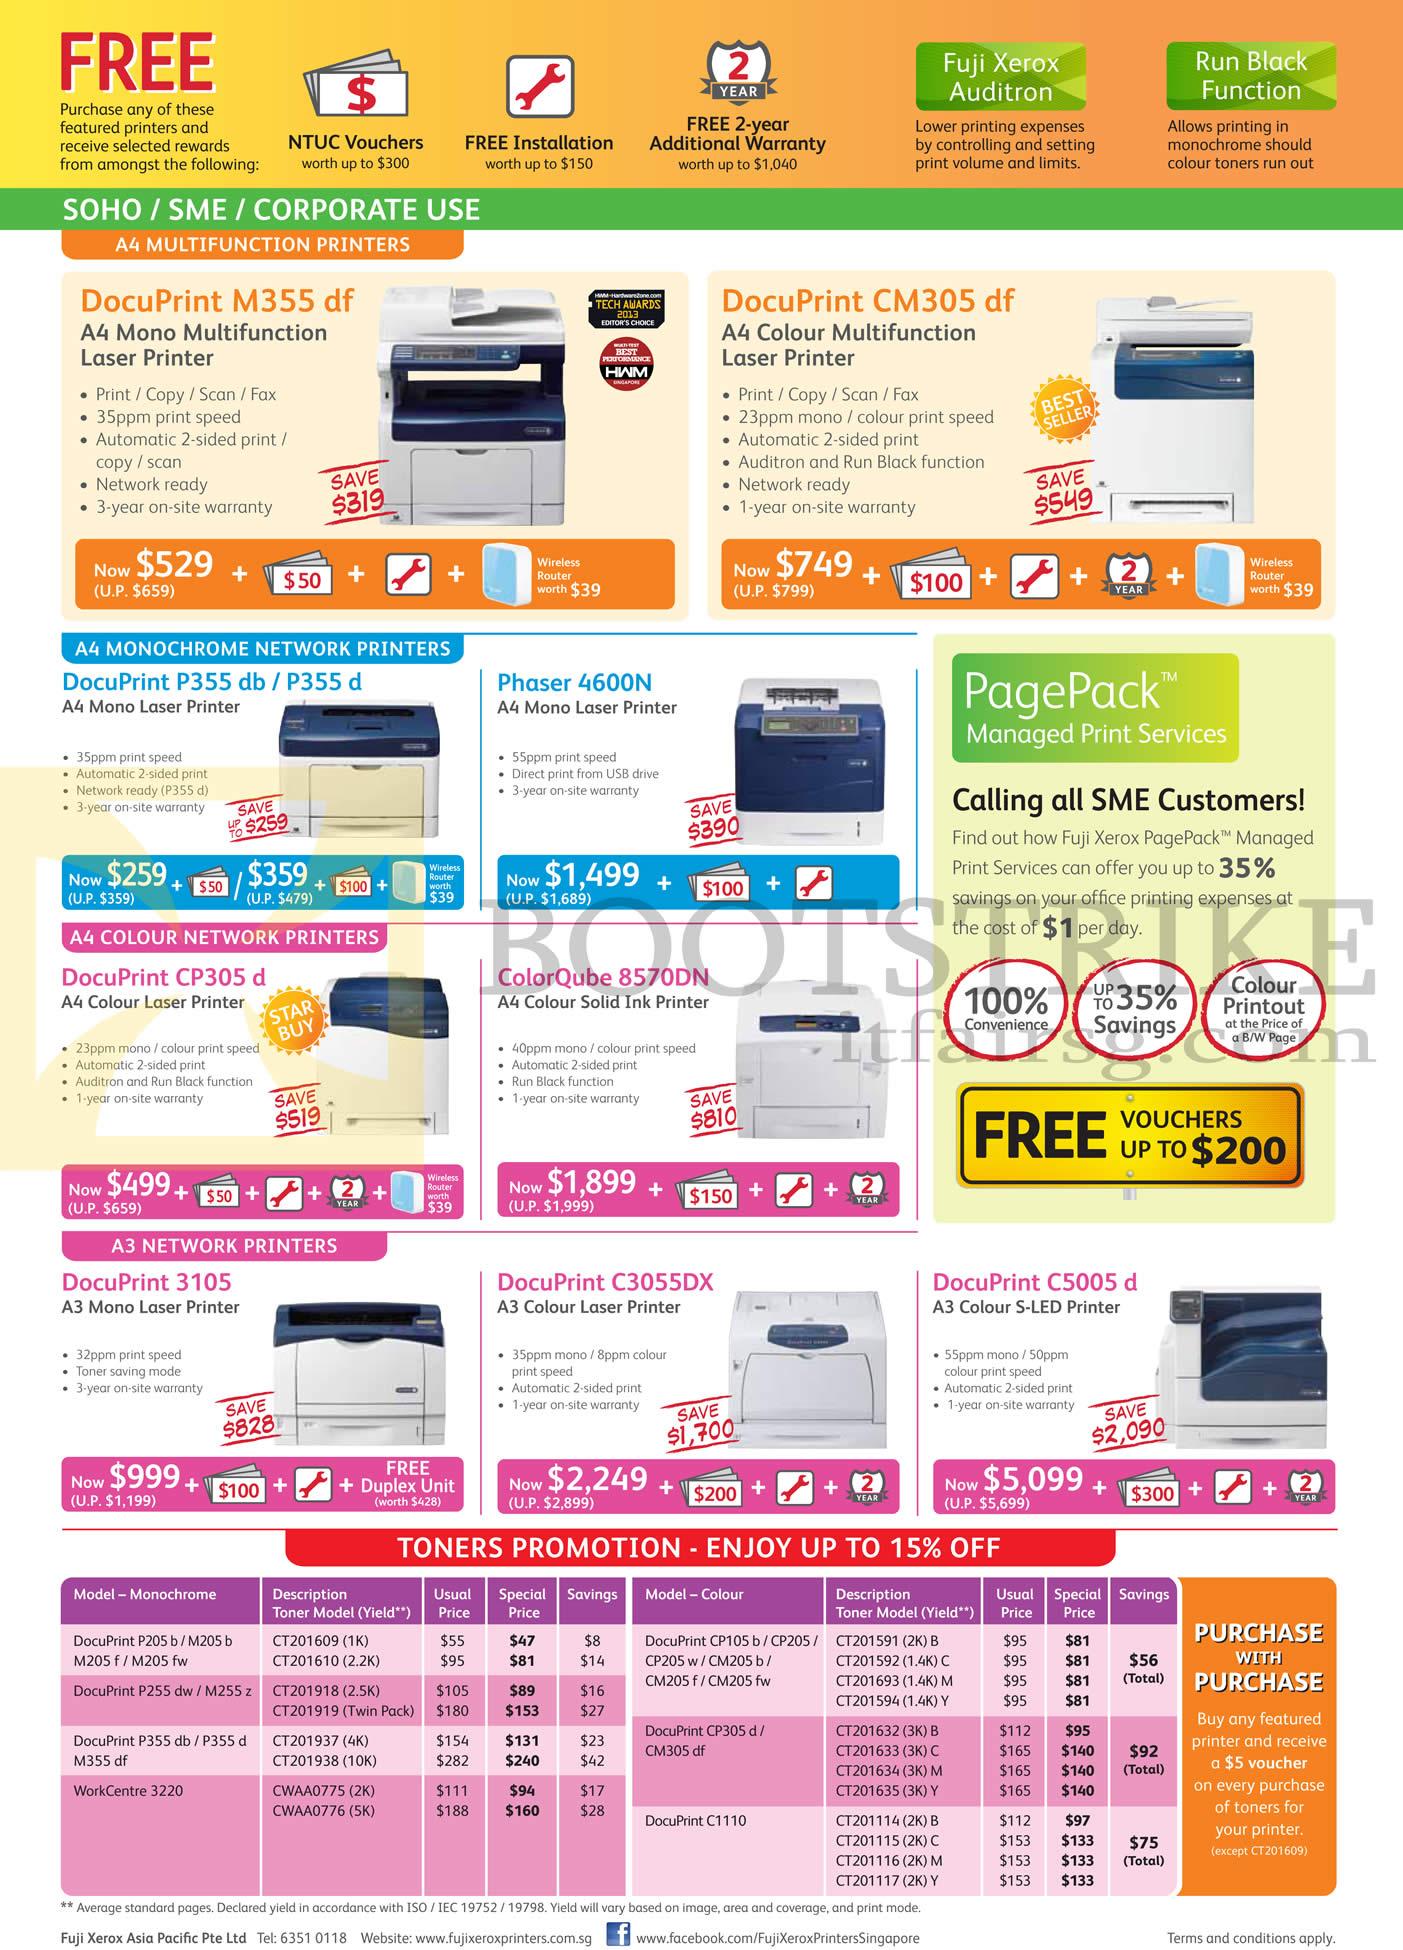 Fuji Xerox Printers DocuPrint M355df, CM305df, P355db, P355d, 4600N